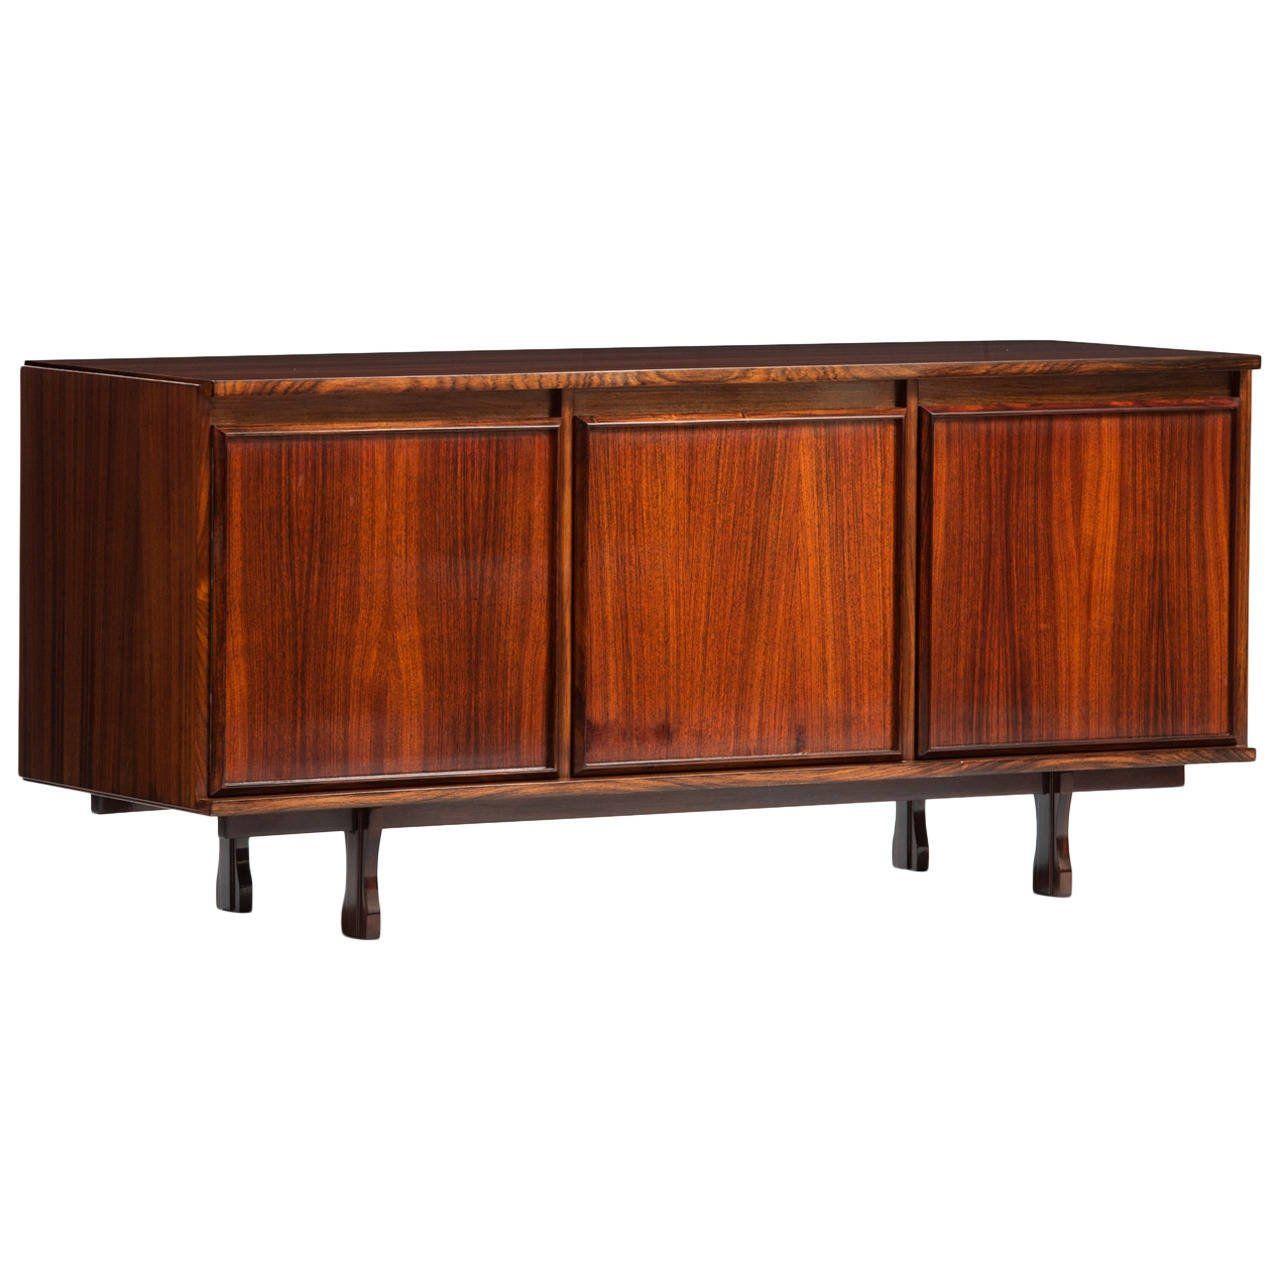 Giovanni ausenda rosewood sideboard for stilwood furniture storage